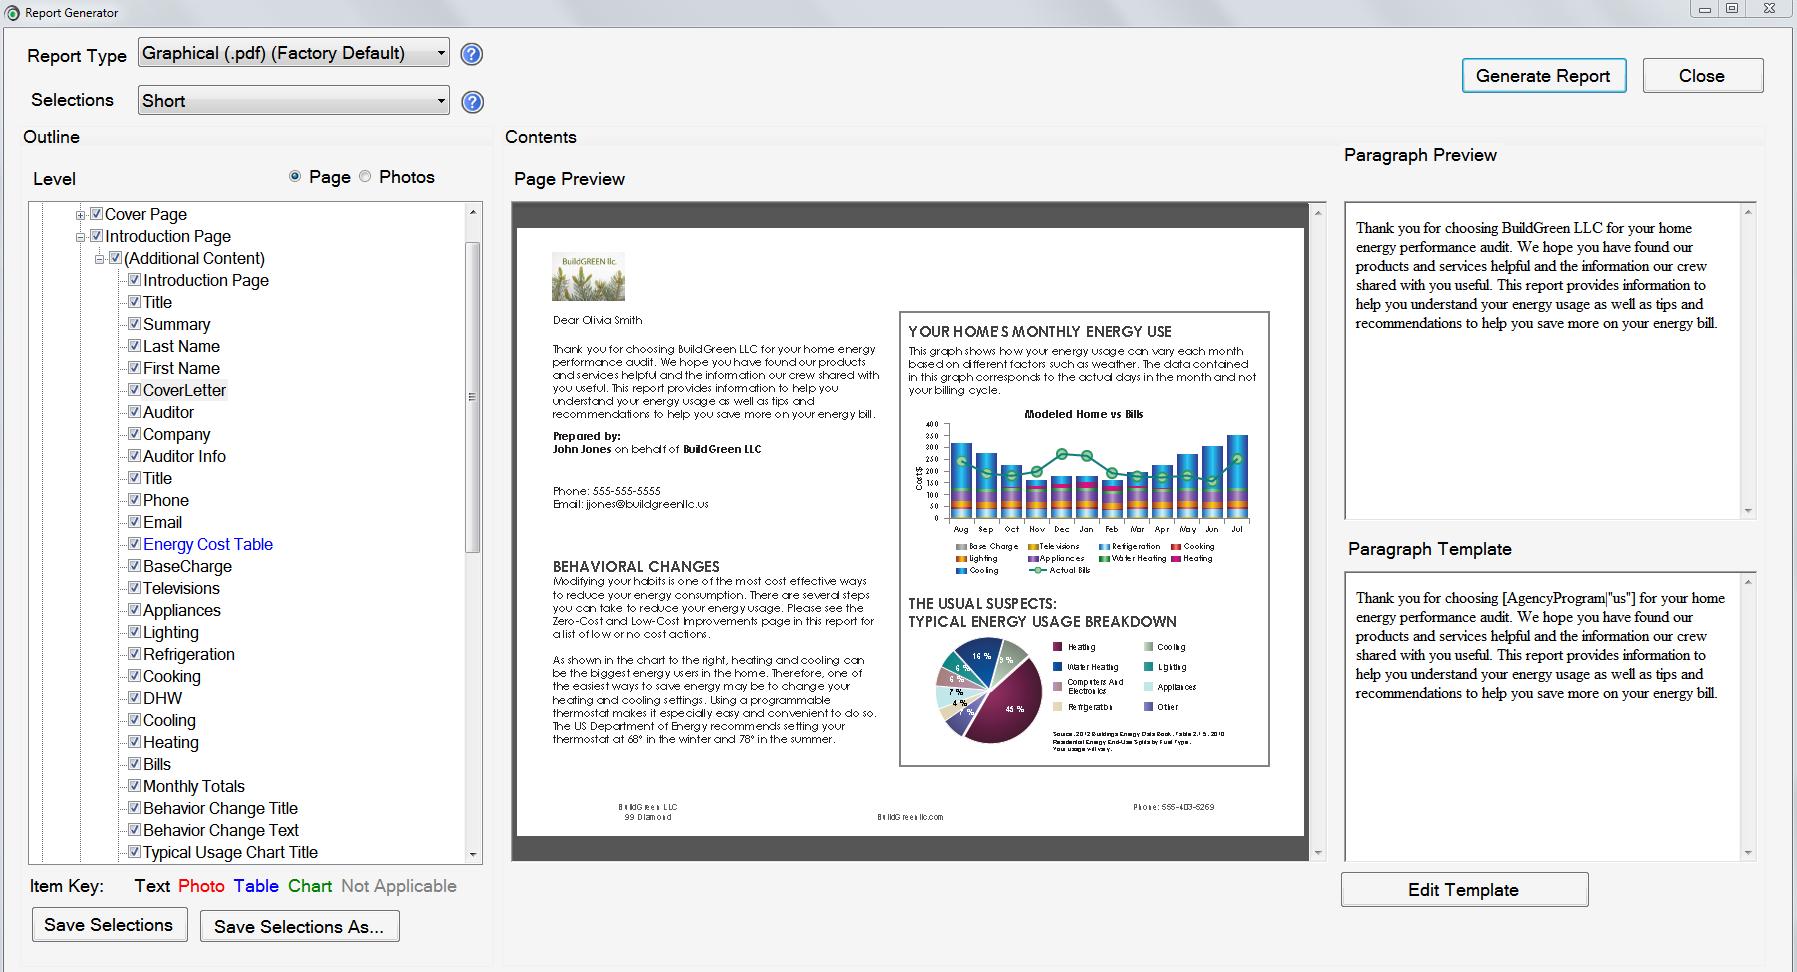 Custom Reports - OptiMiser